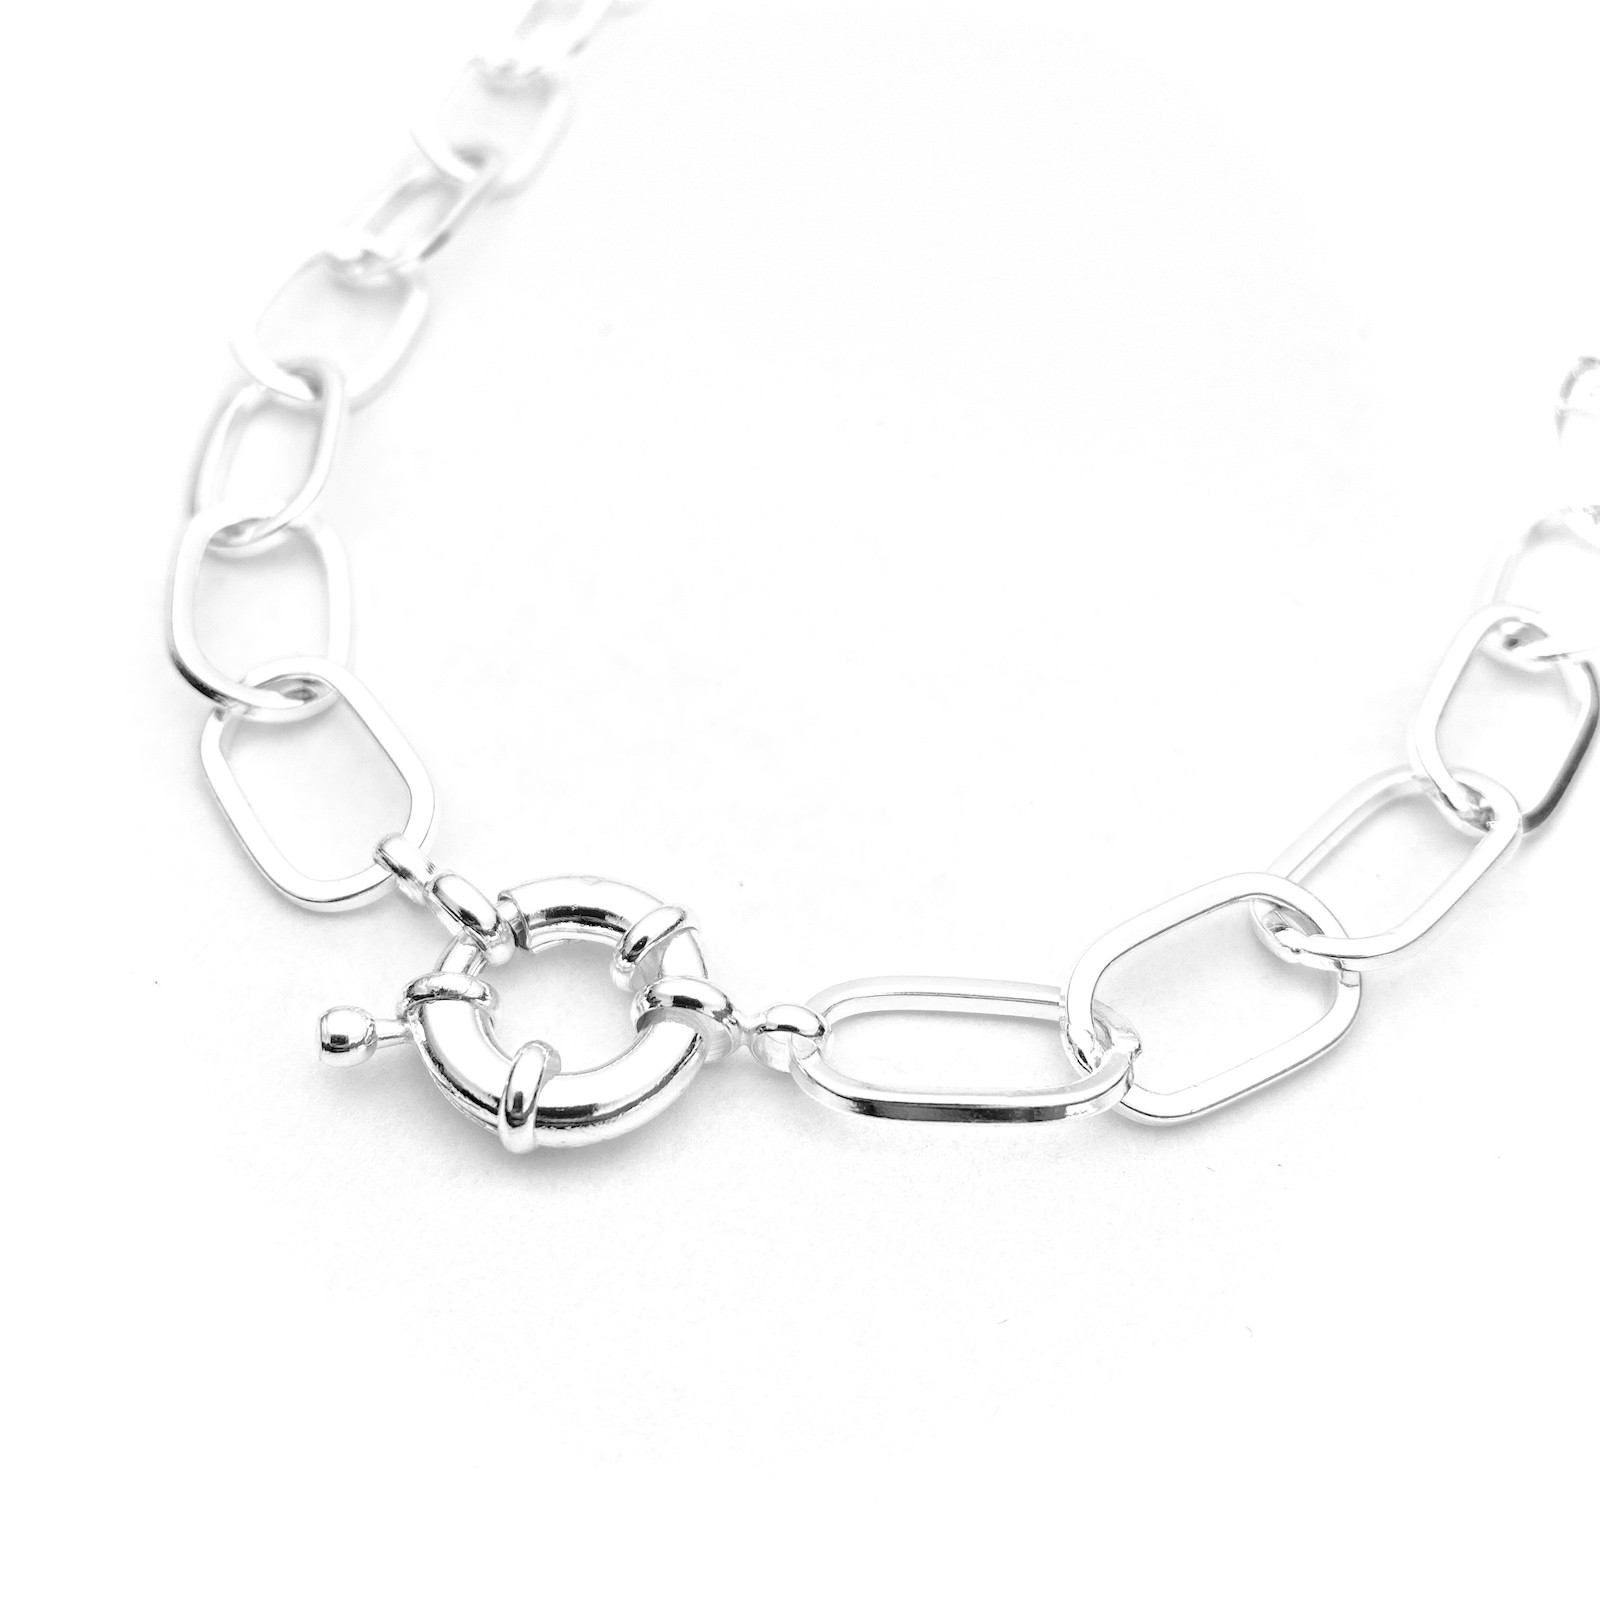 Corrente Chain Elos Fecho Boia 40cm 20g (Banho Prata 925)